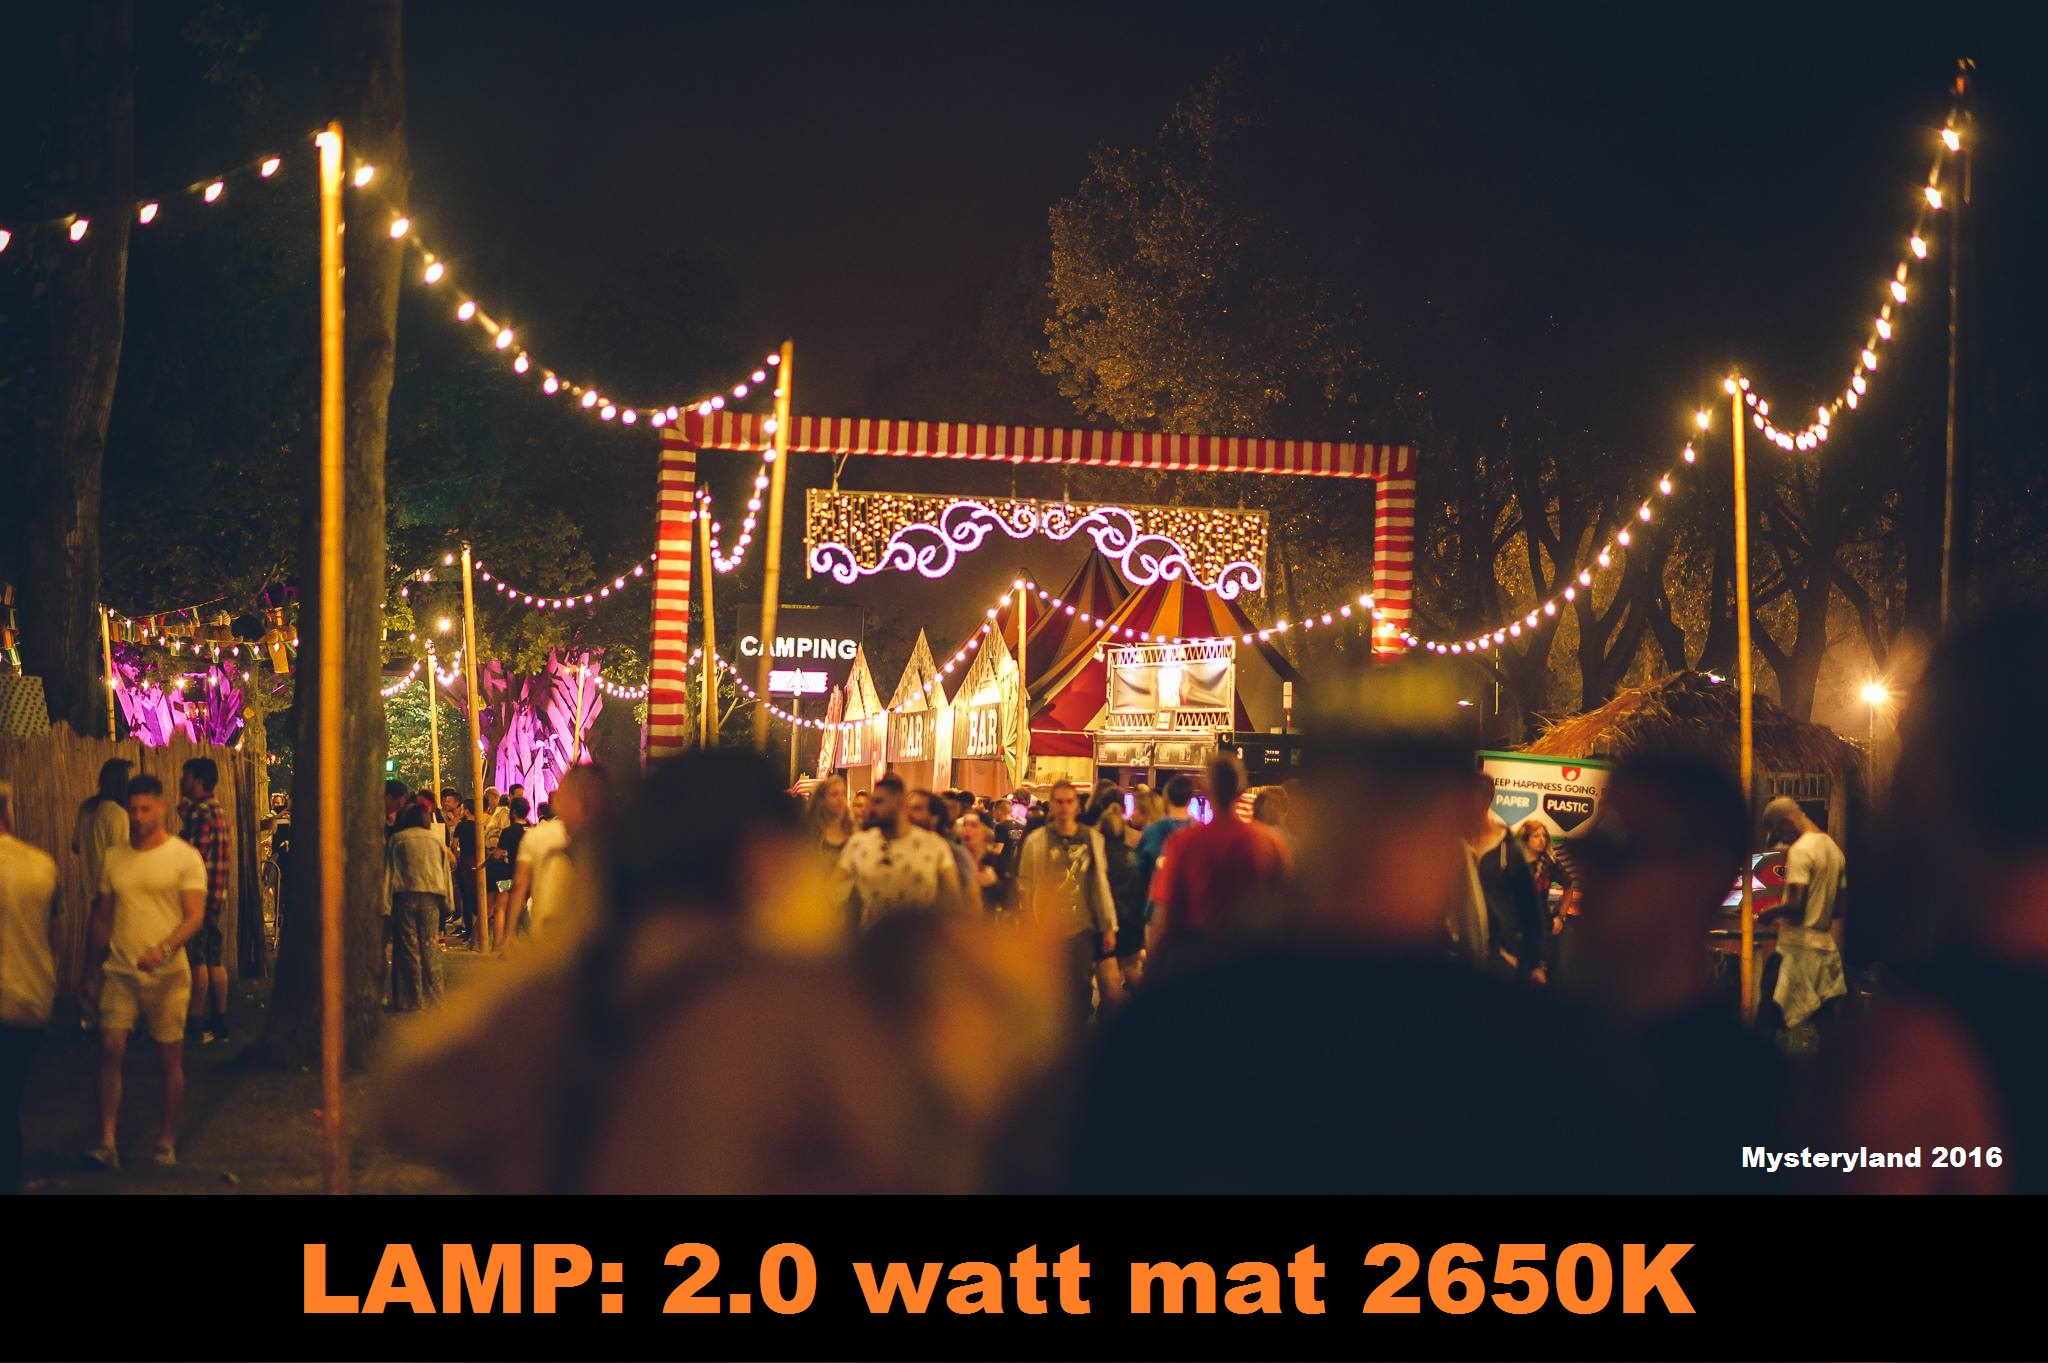 Prikkabel 25 meter 25 warm witte LED lampen – Prikkabelverhuur.nl